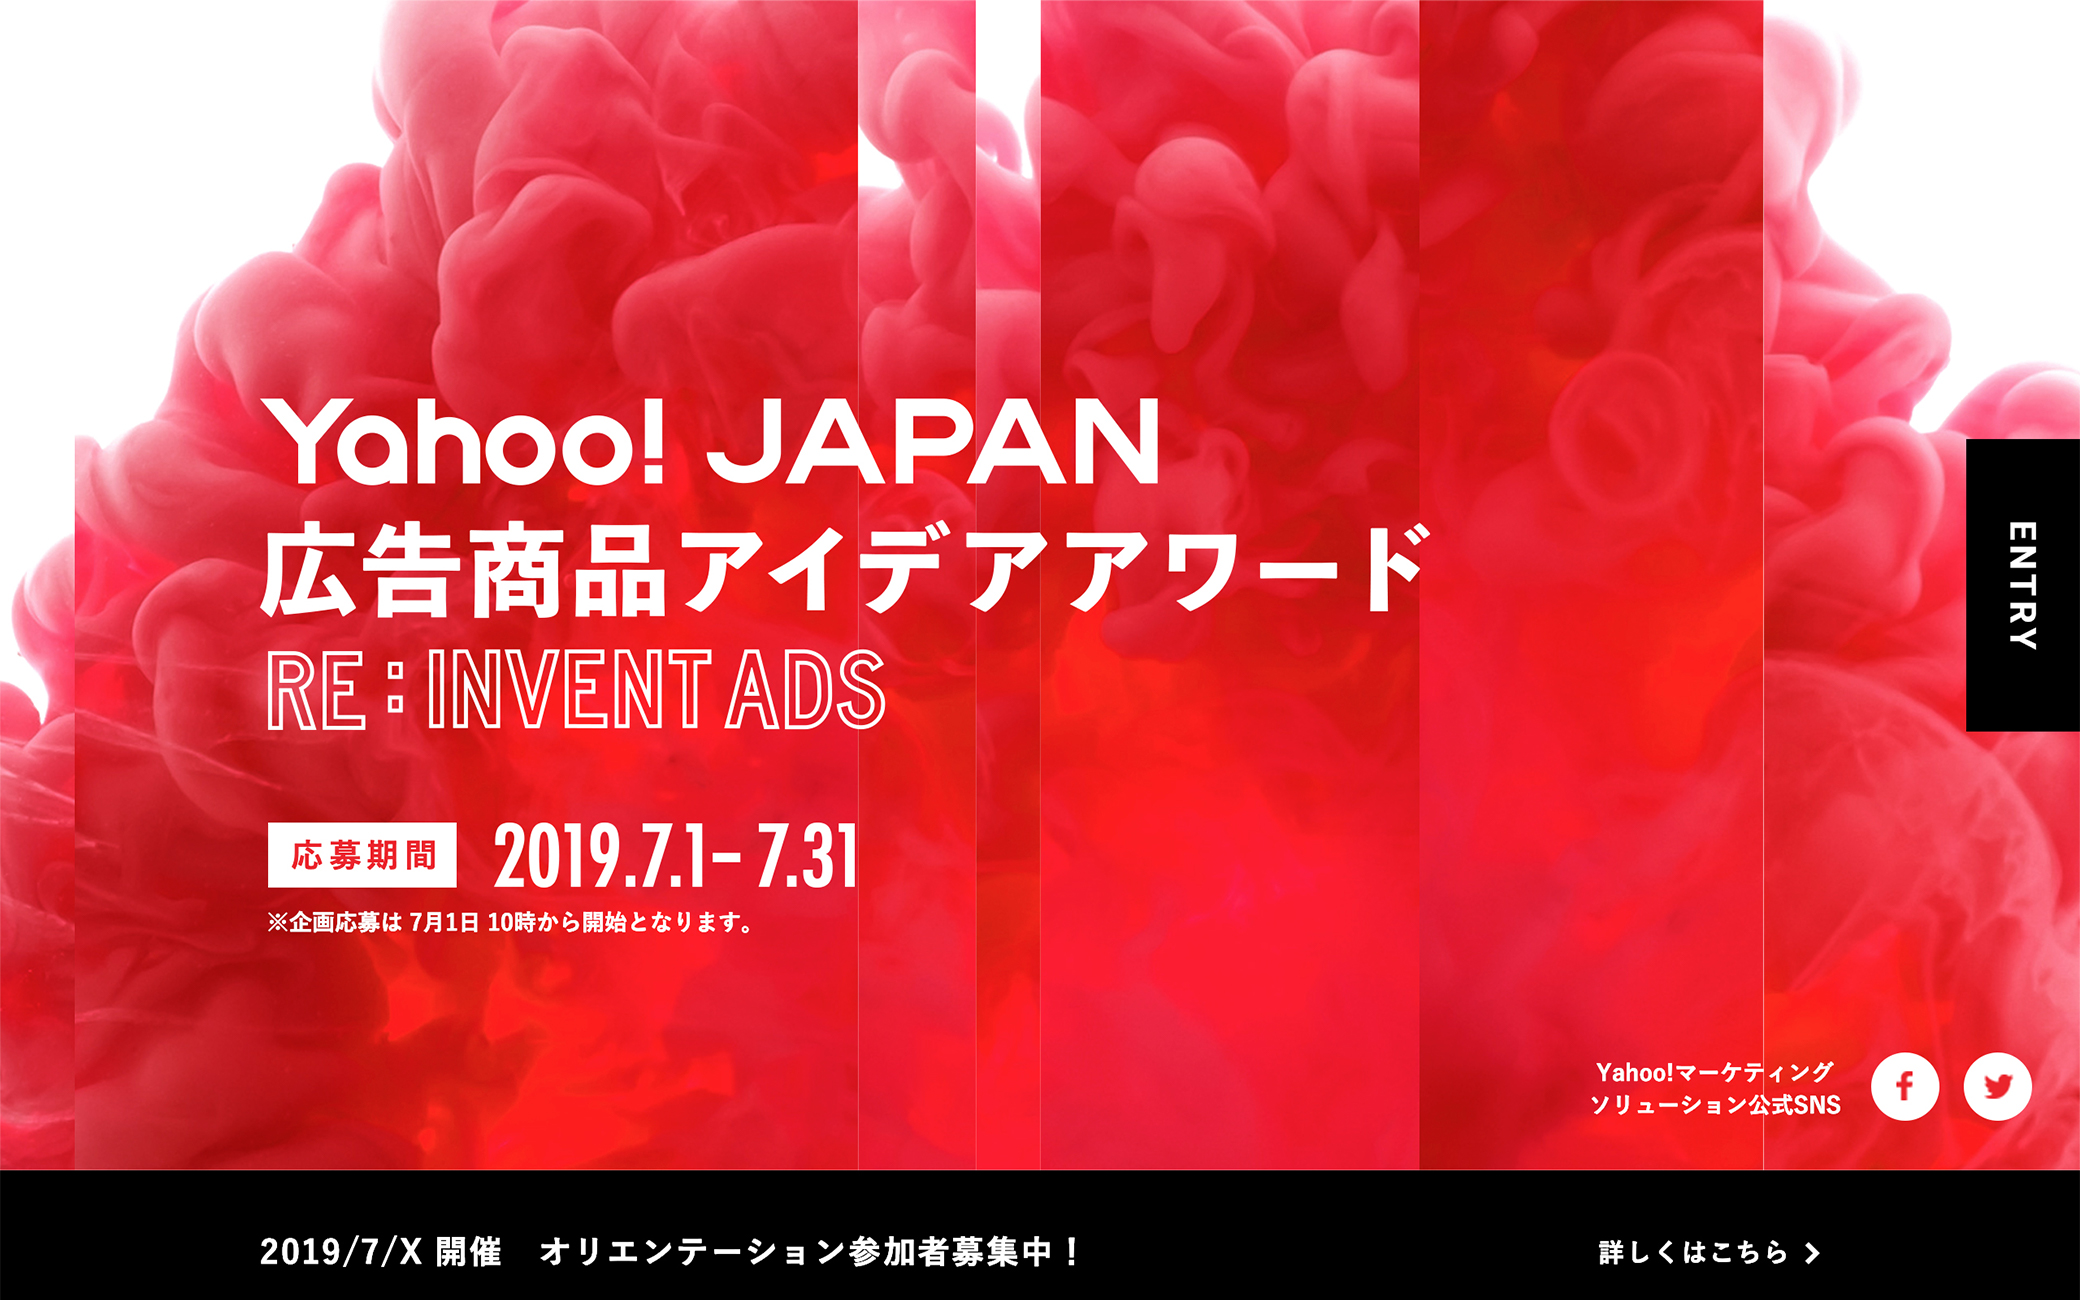 Yahoo! JAPAN 広告商品アイデアアワード